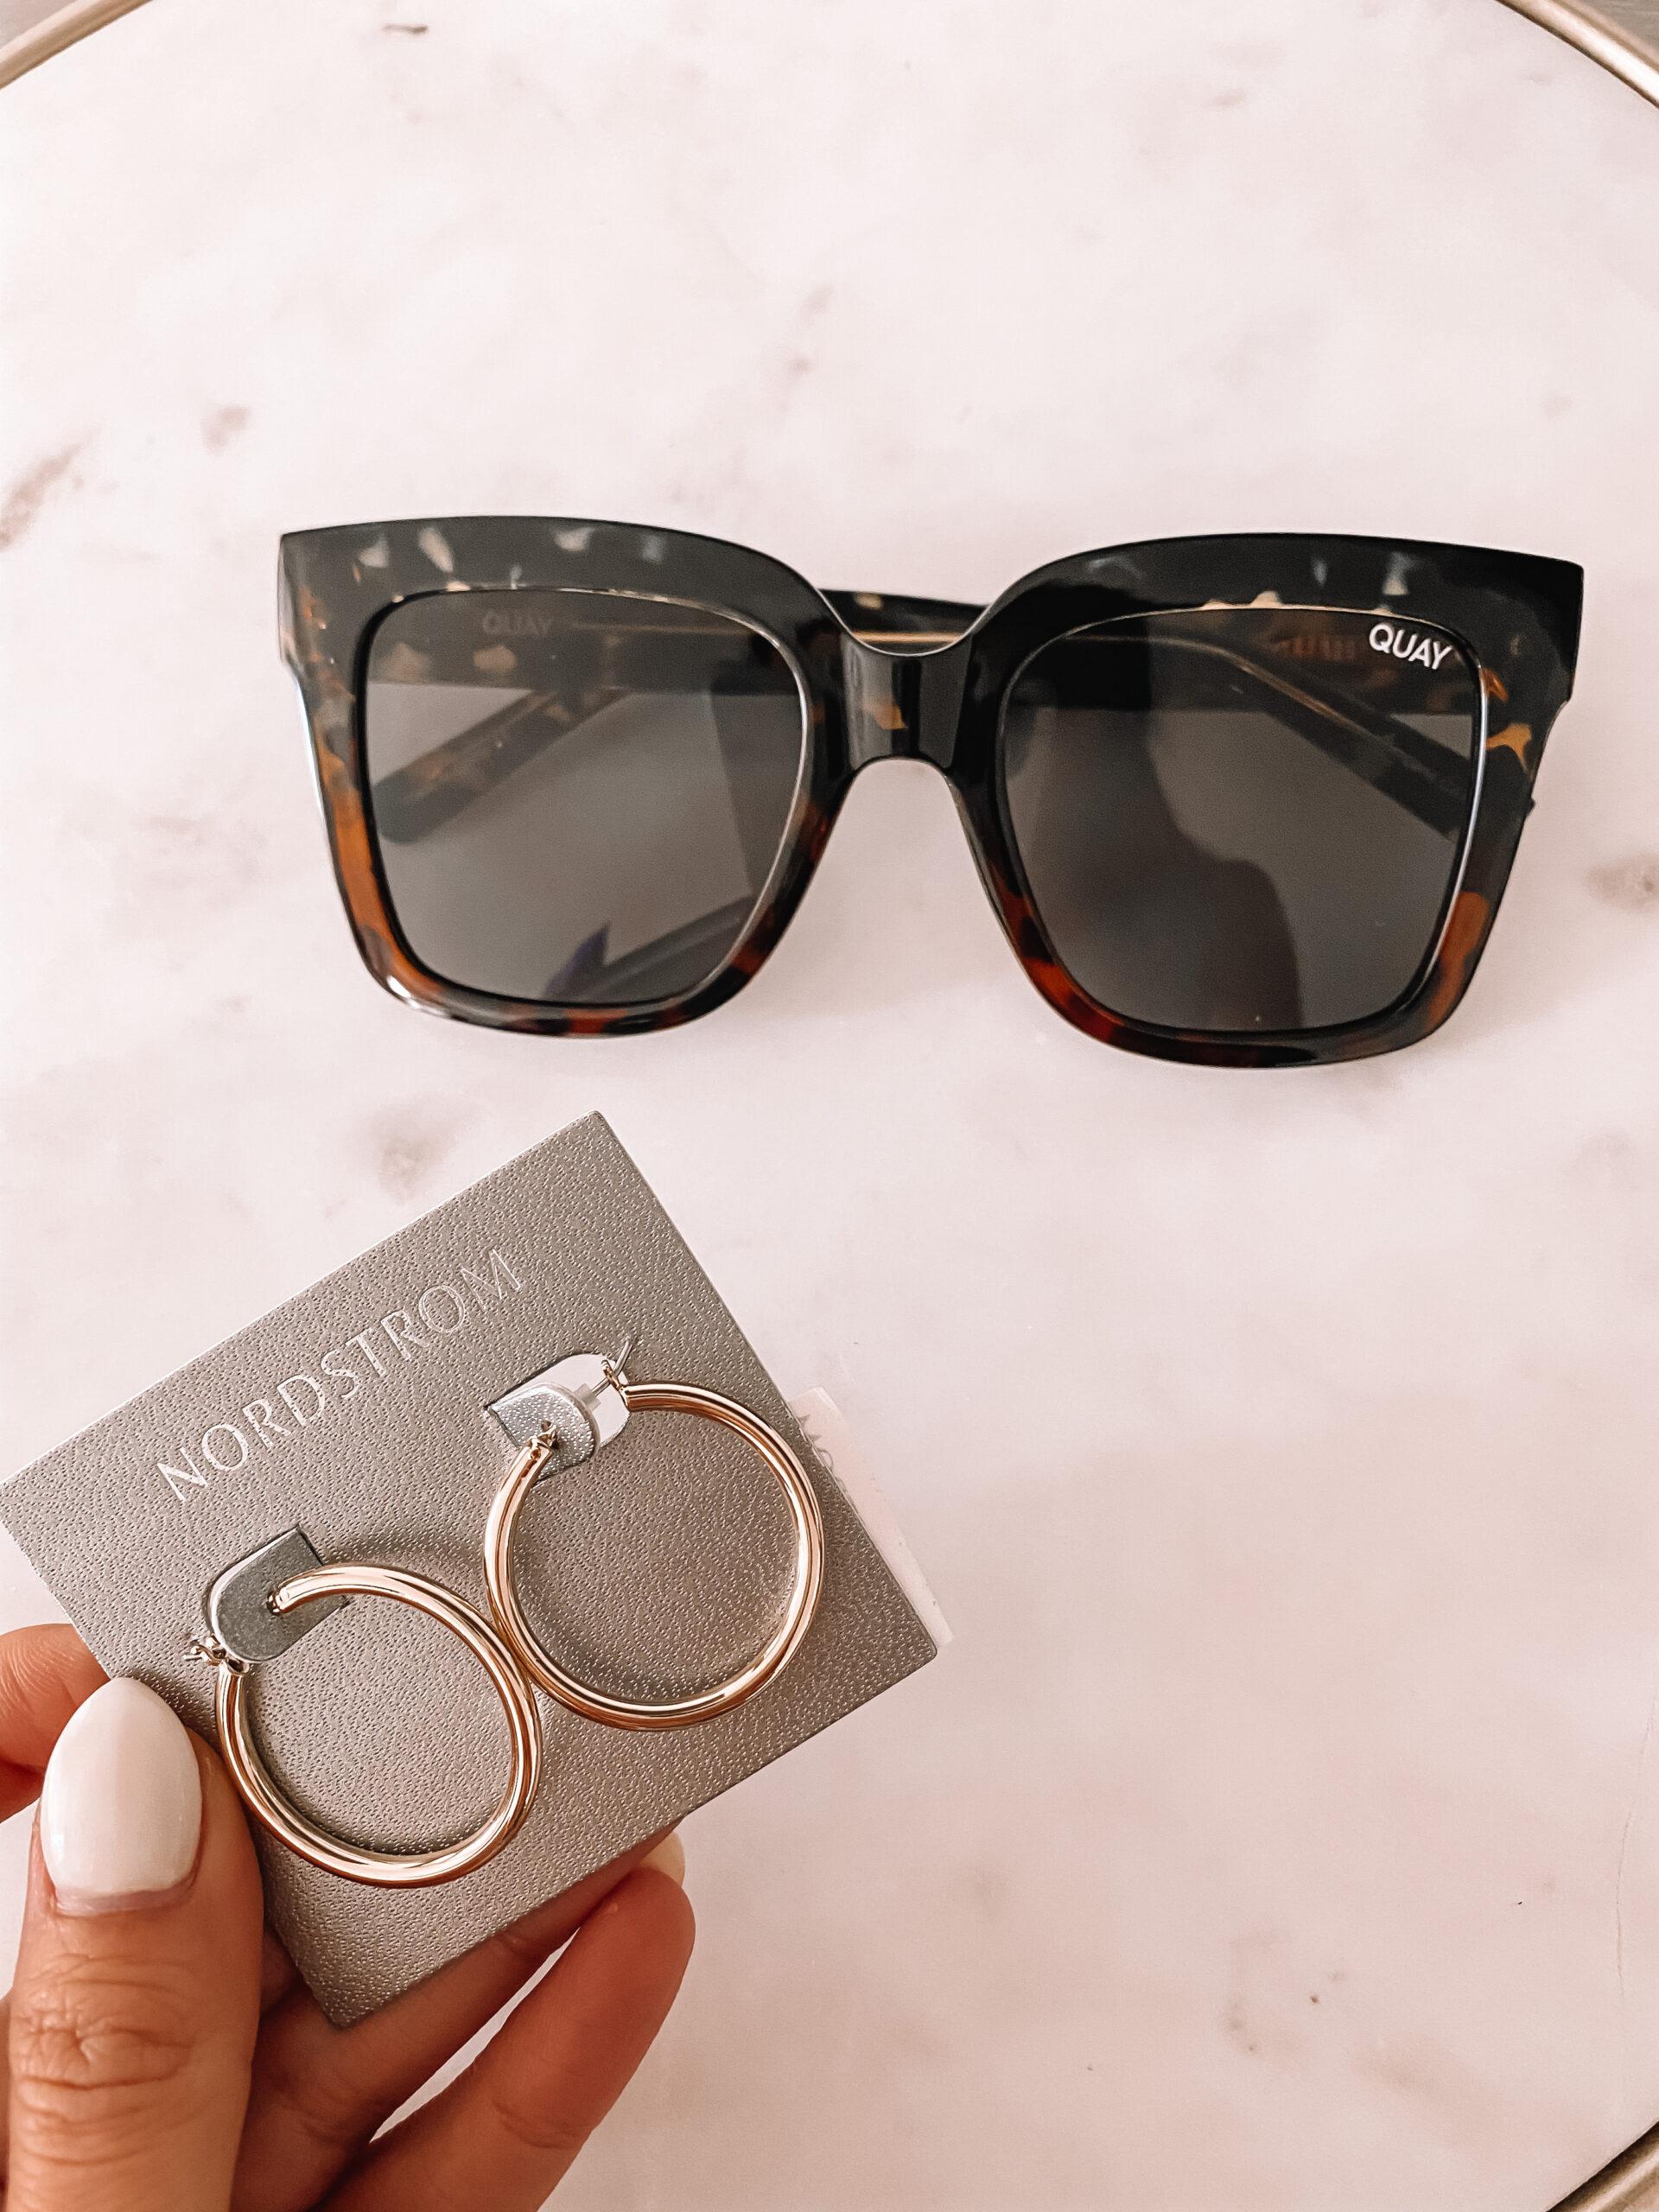 quay sunglasses and gold hoop earrings